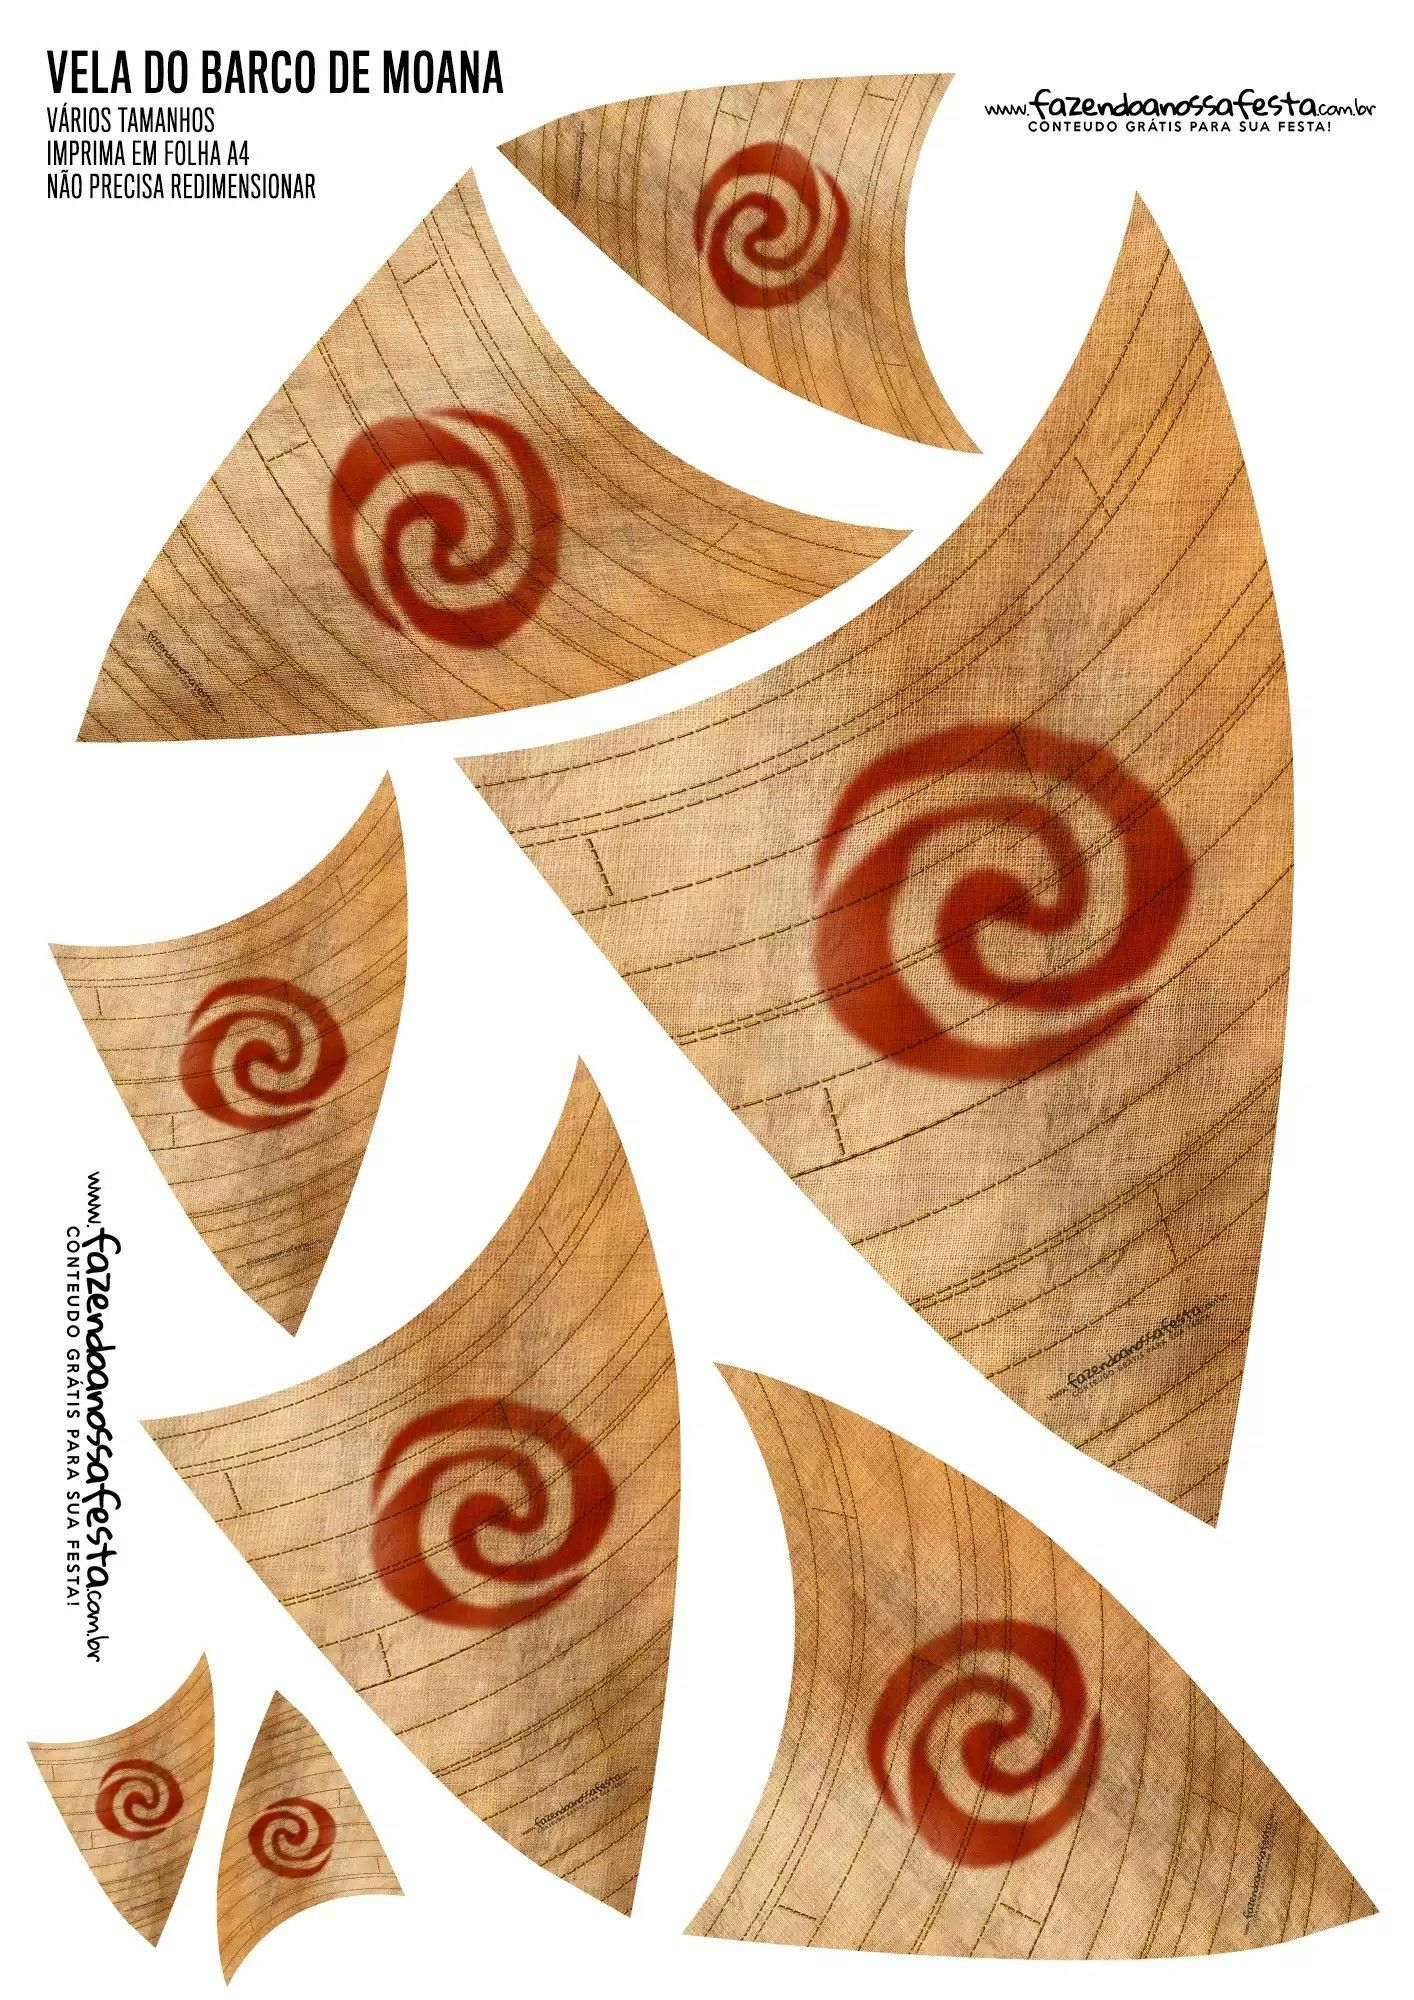 Amazing image with regard to moana sail printable